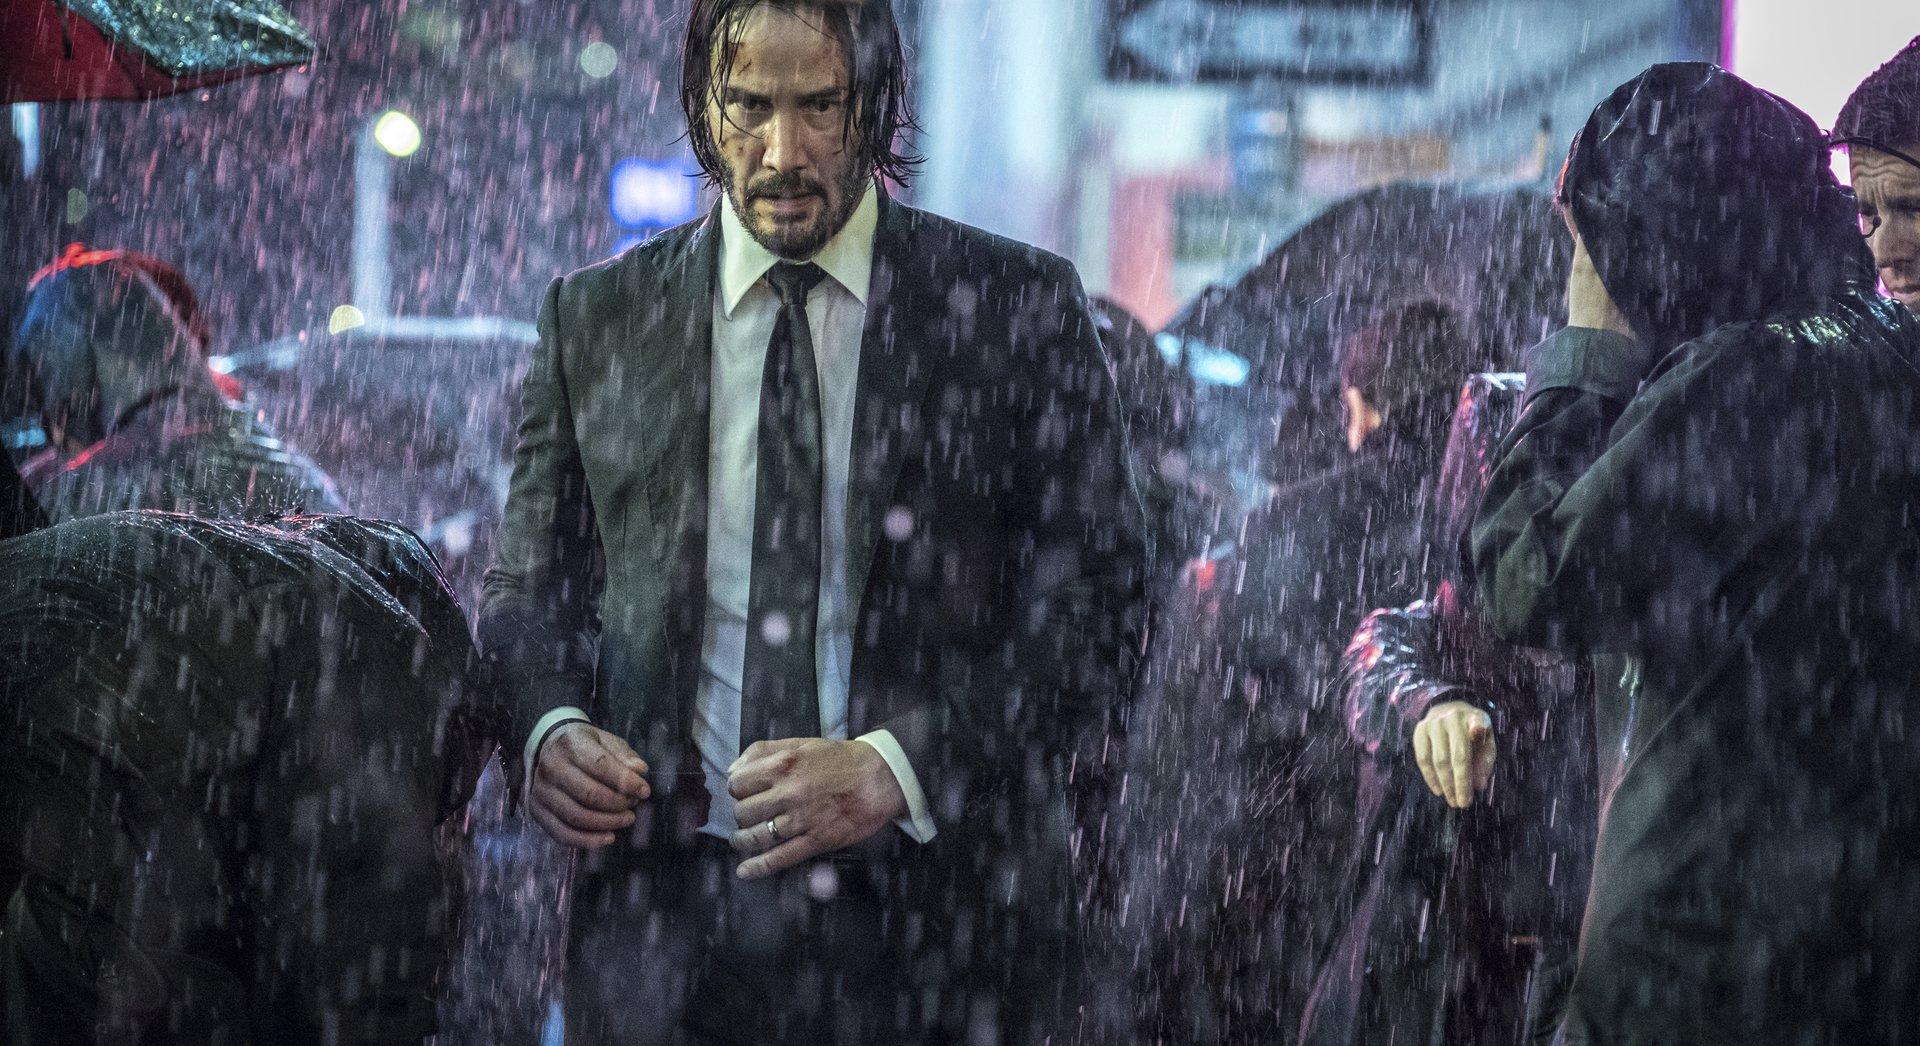 Keanu Reeves 'John Wick 3' dethrones 'Avengers: Endgame' with $57 million